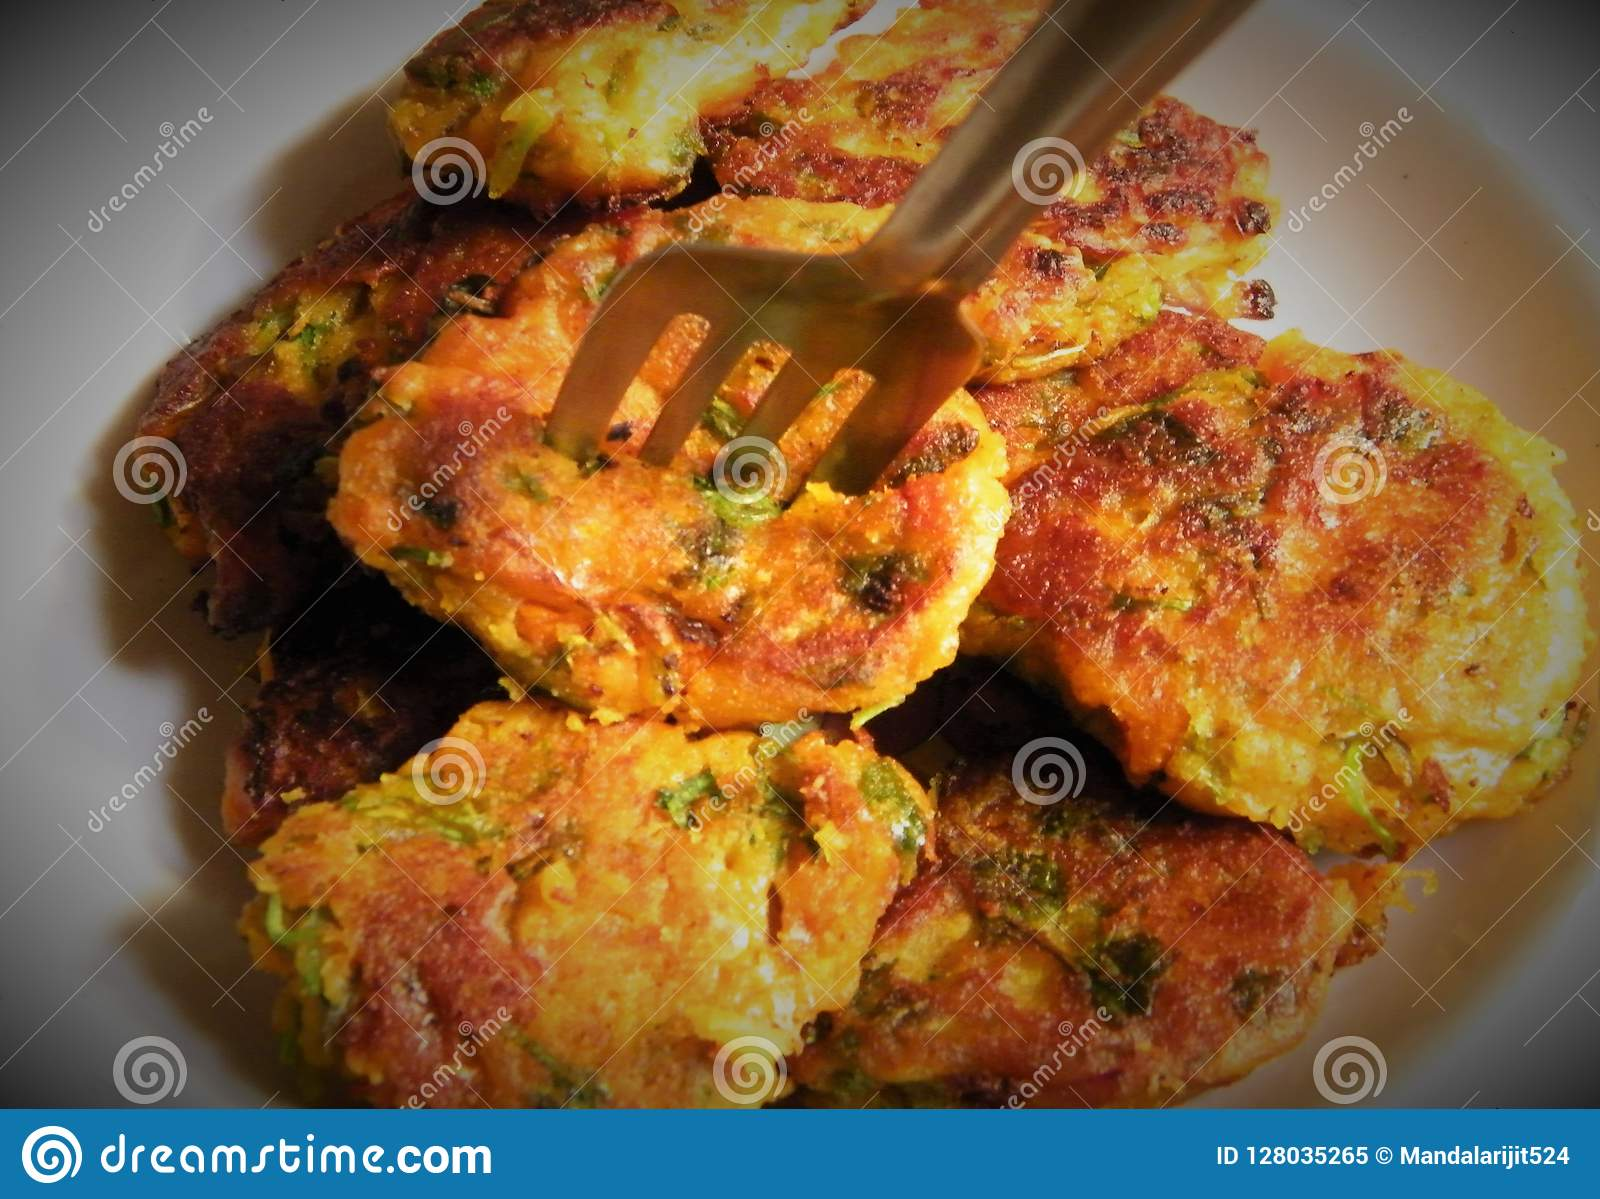 This a kind of veg pakora